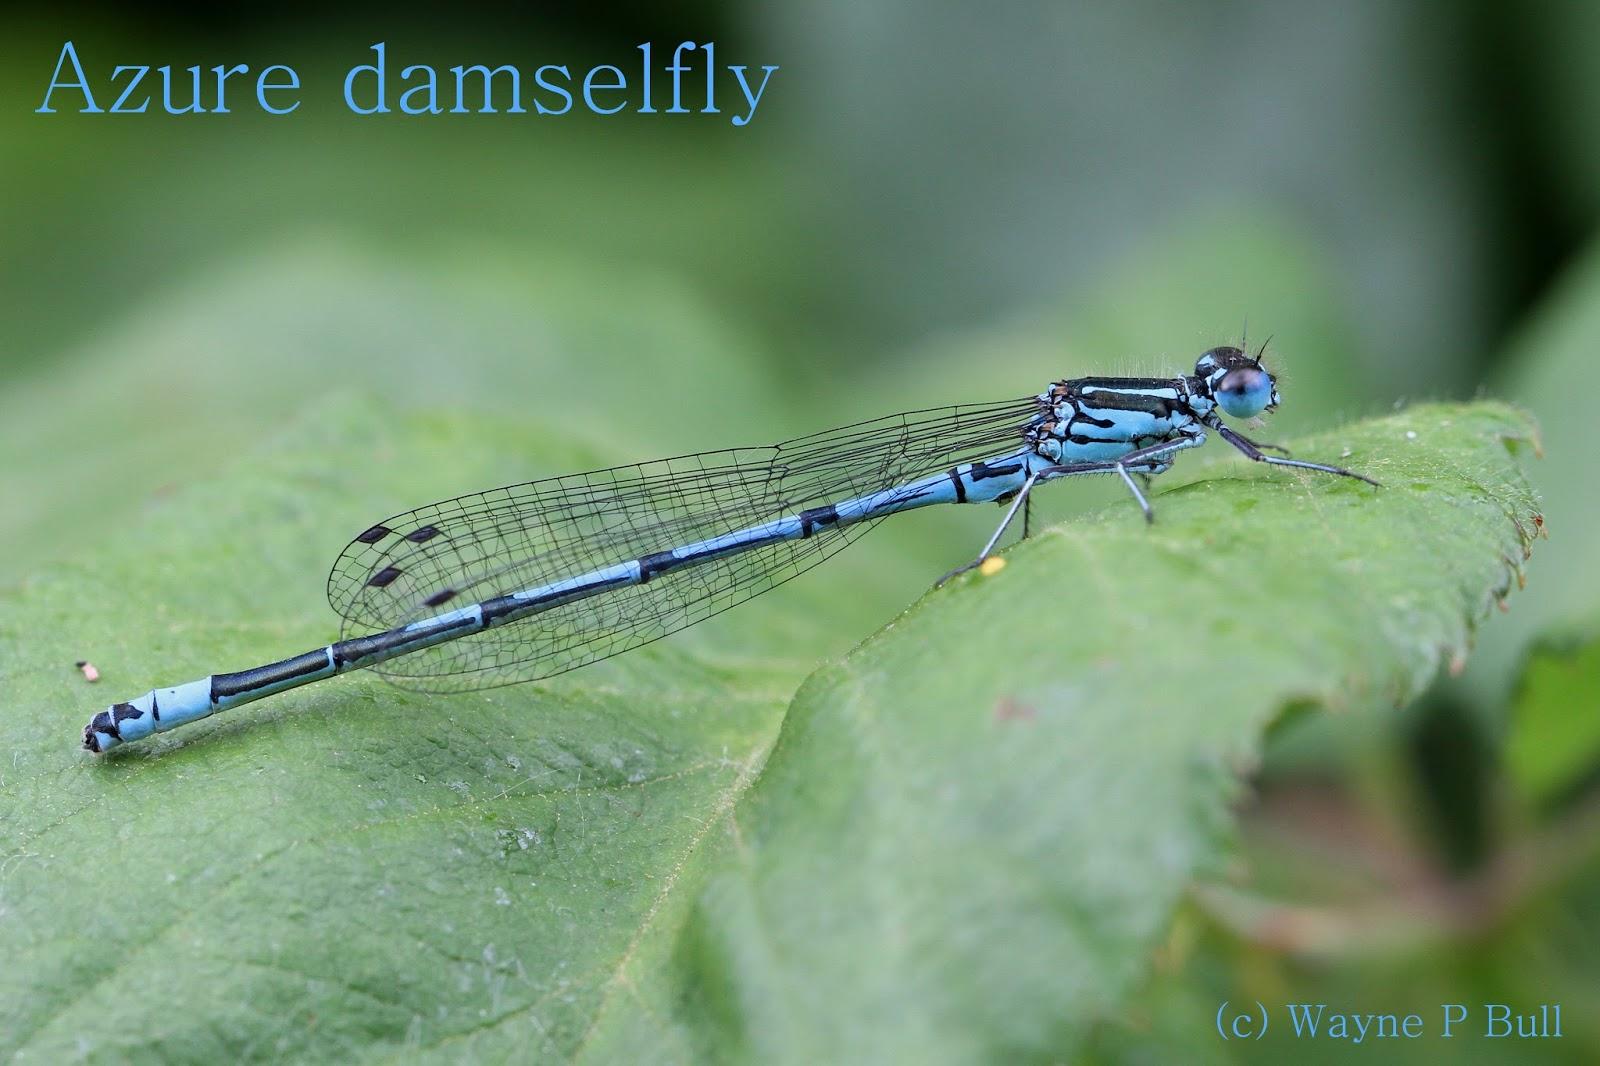 azure damsel flies fly - photo #24